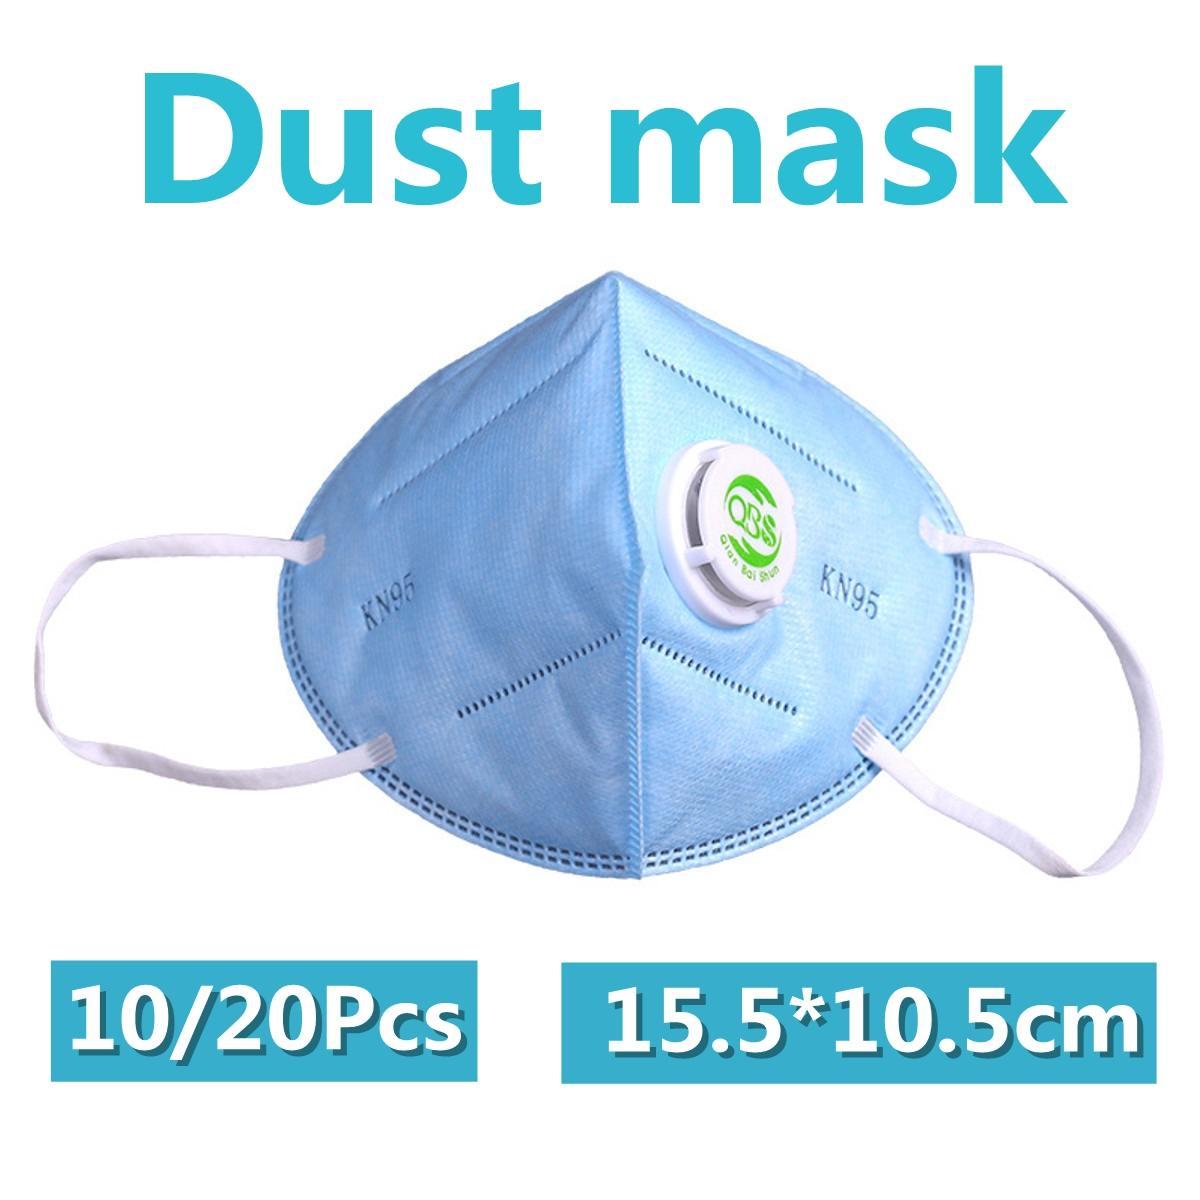 3D Non-woven Face Mouth Particulate Respirator Mask Anti Fog Haze PM2.5 Masks Air Pollution Filter Breath Valve Anti-dust3D Non-woven Face Mouth Particulate Respirator Mask Anti Fog Haze PM2.5 Masks Air Pollution Filter Breath Valve Anti-dust